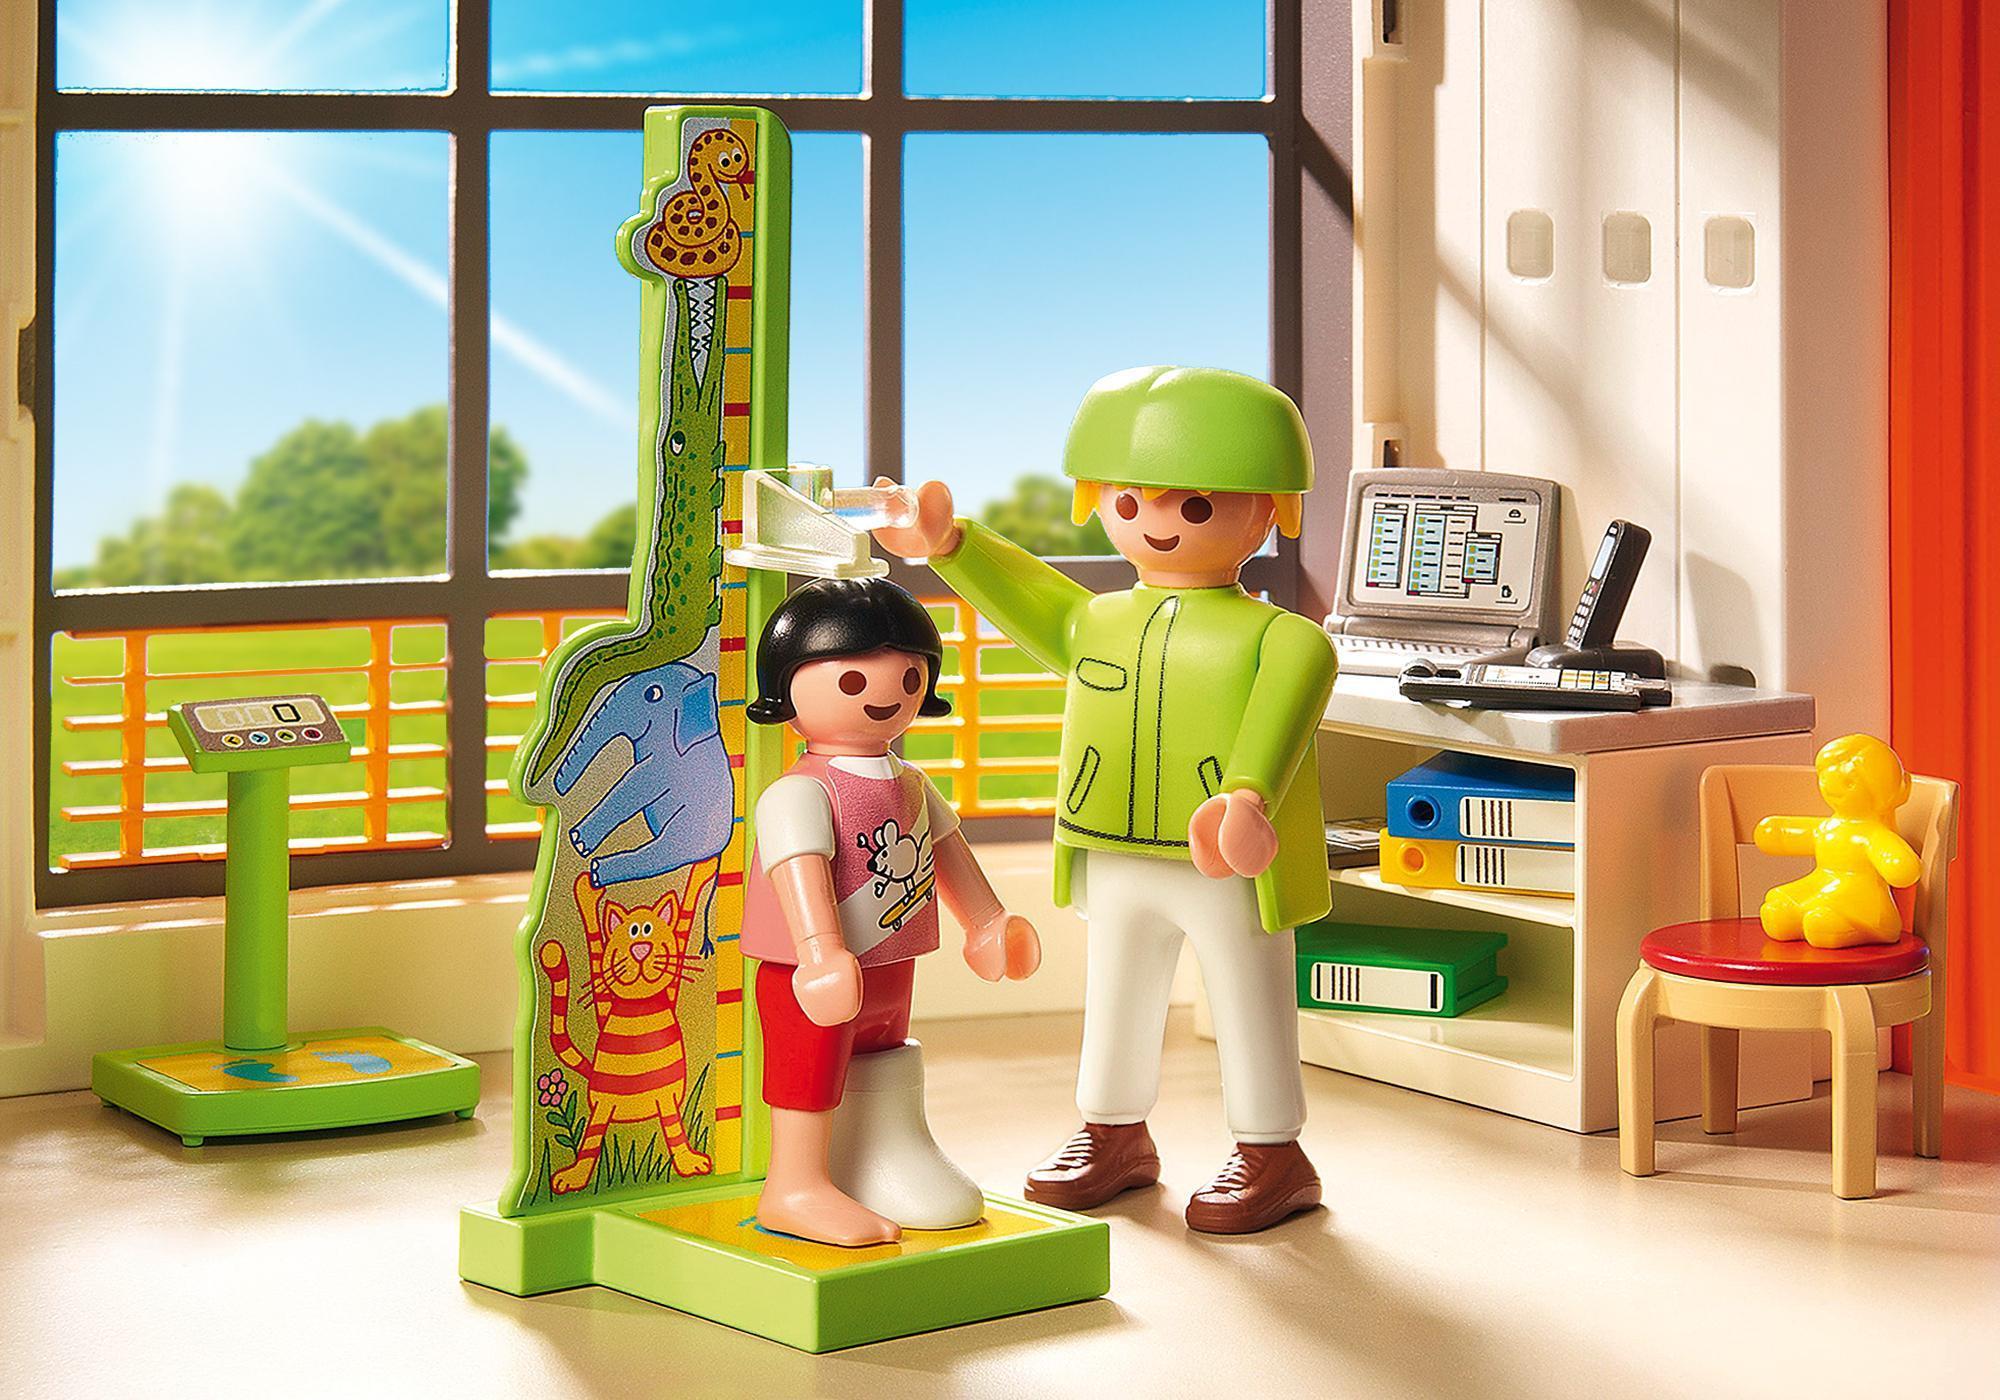 http://media.playmobil.com/i/playmobil/6657_product_extra2